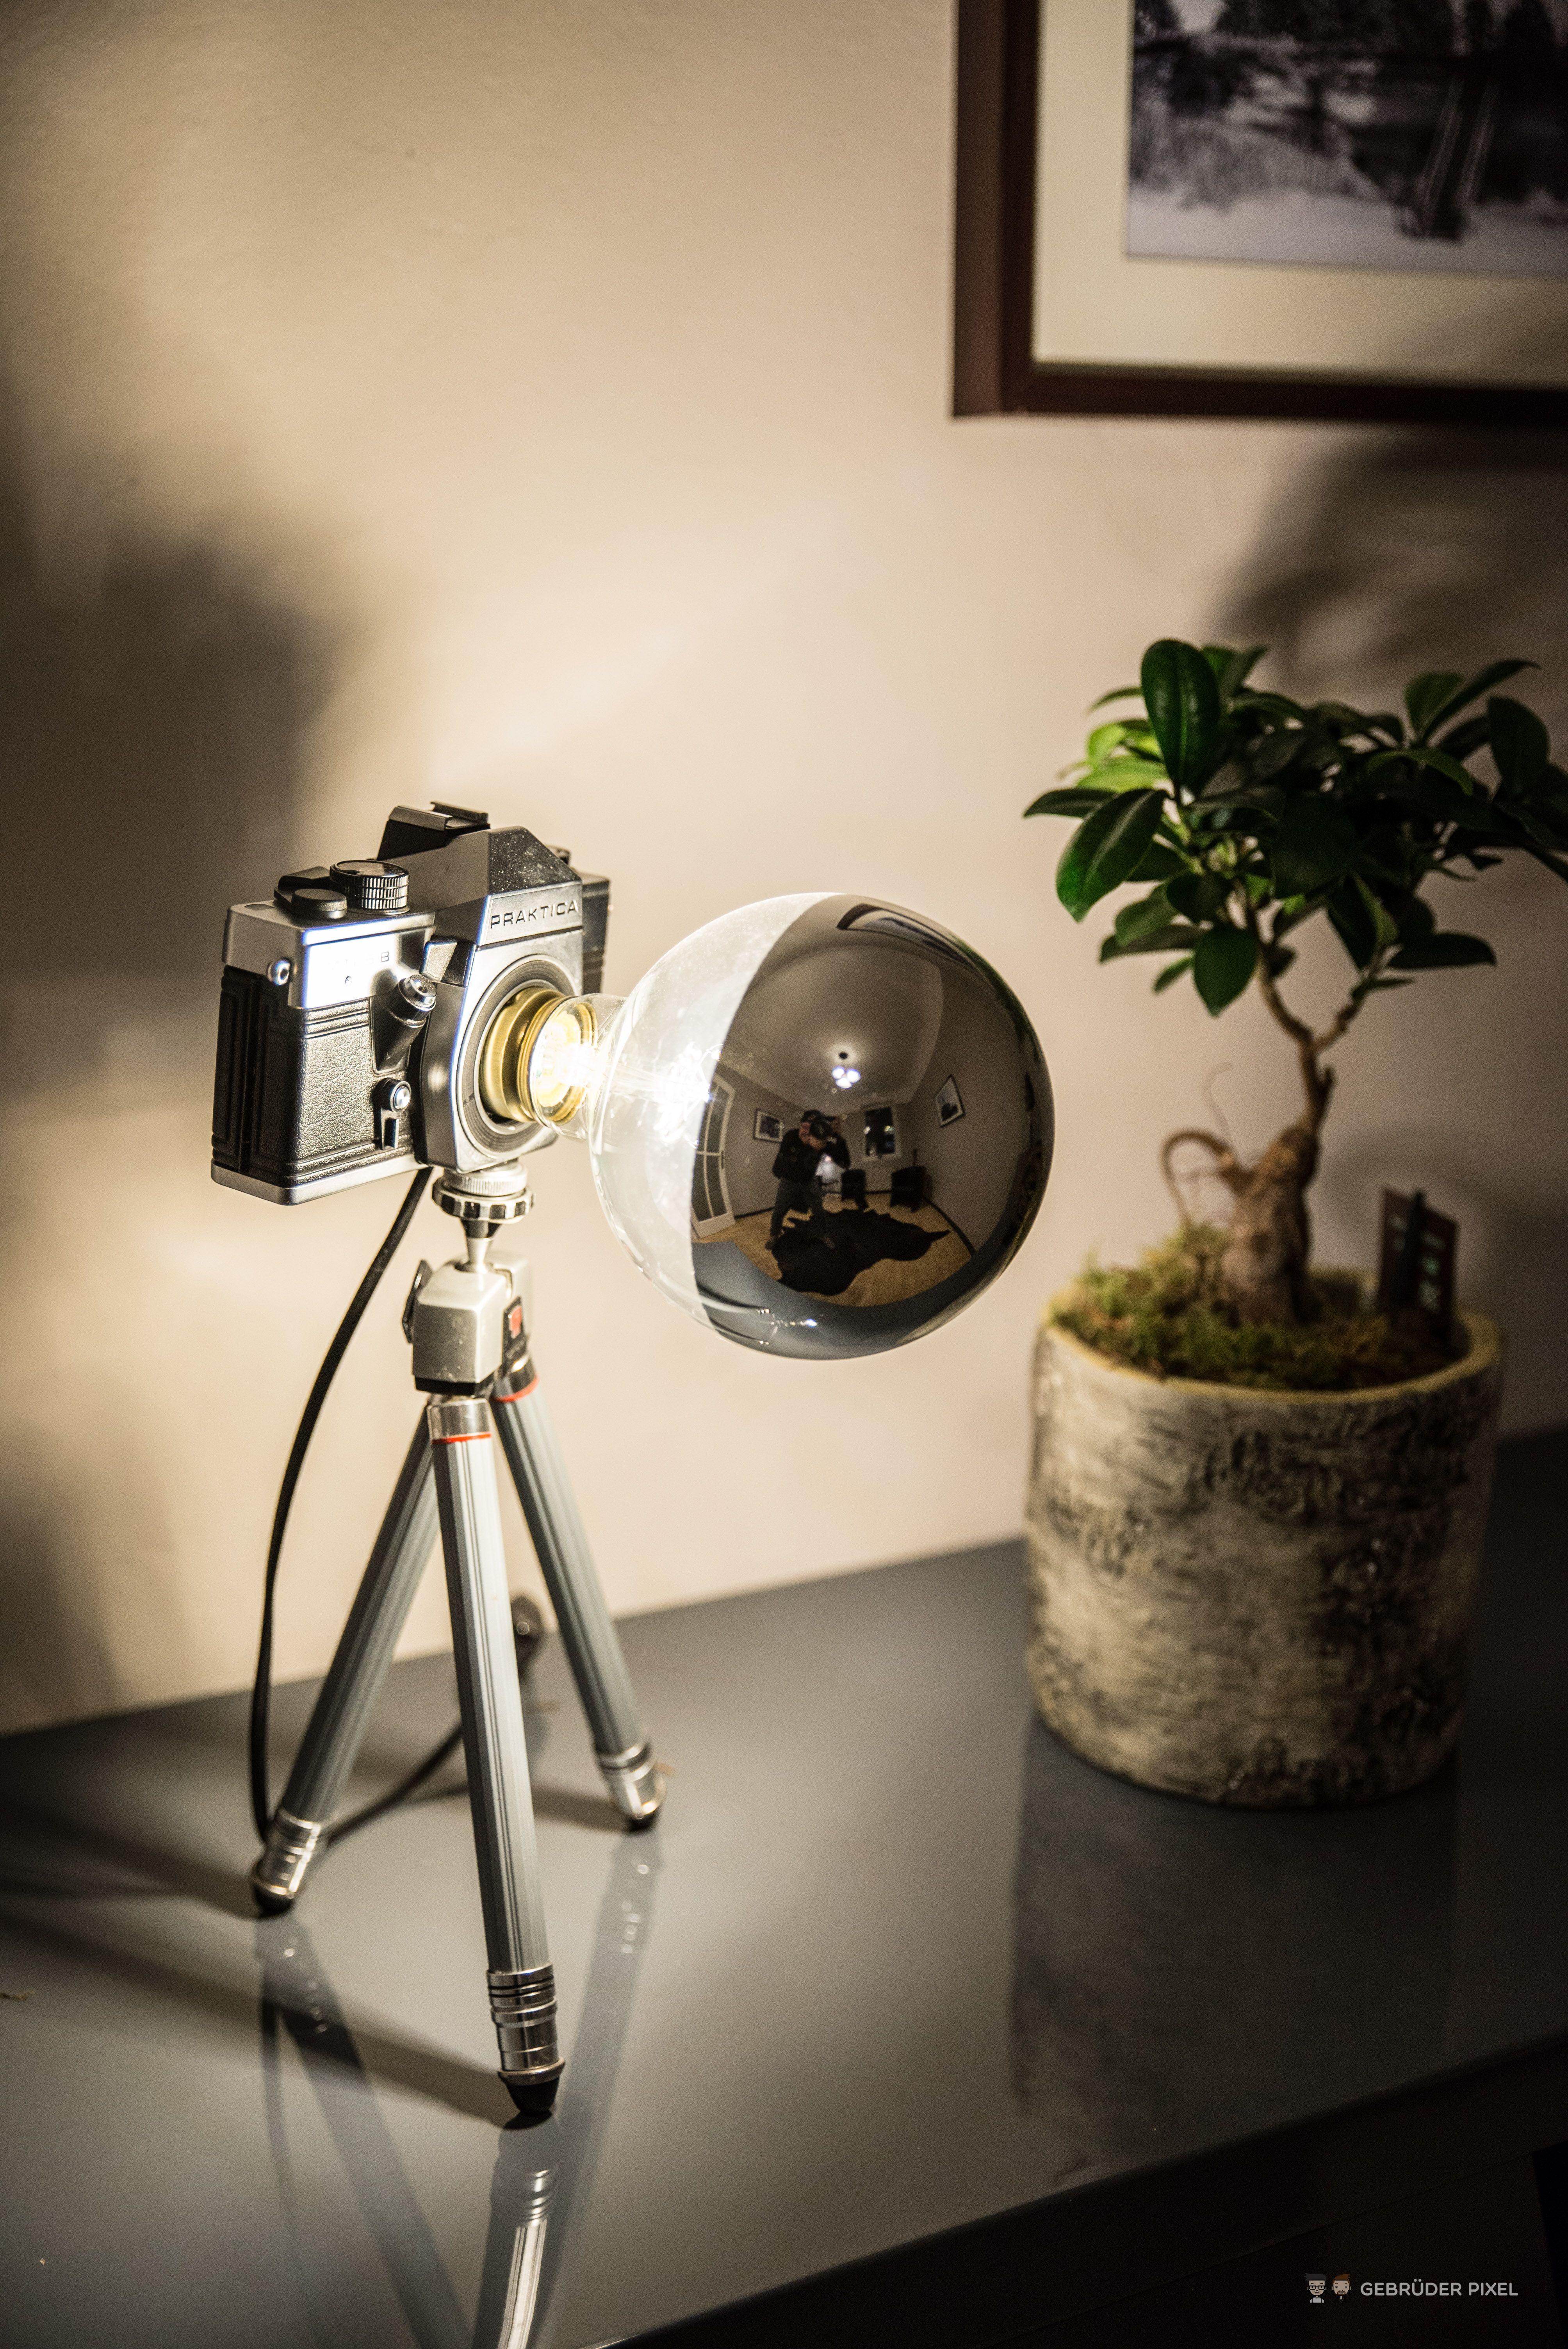 0dbe96bec4d3b39fde732f99c3e28cf4 Résultat Supérieur 60 Luxe Lampe Decorative Stock 2018 Ldkt